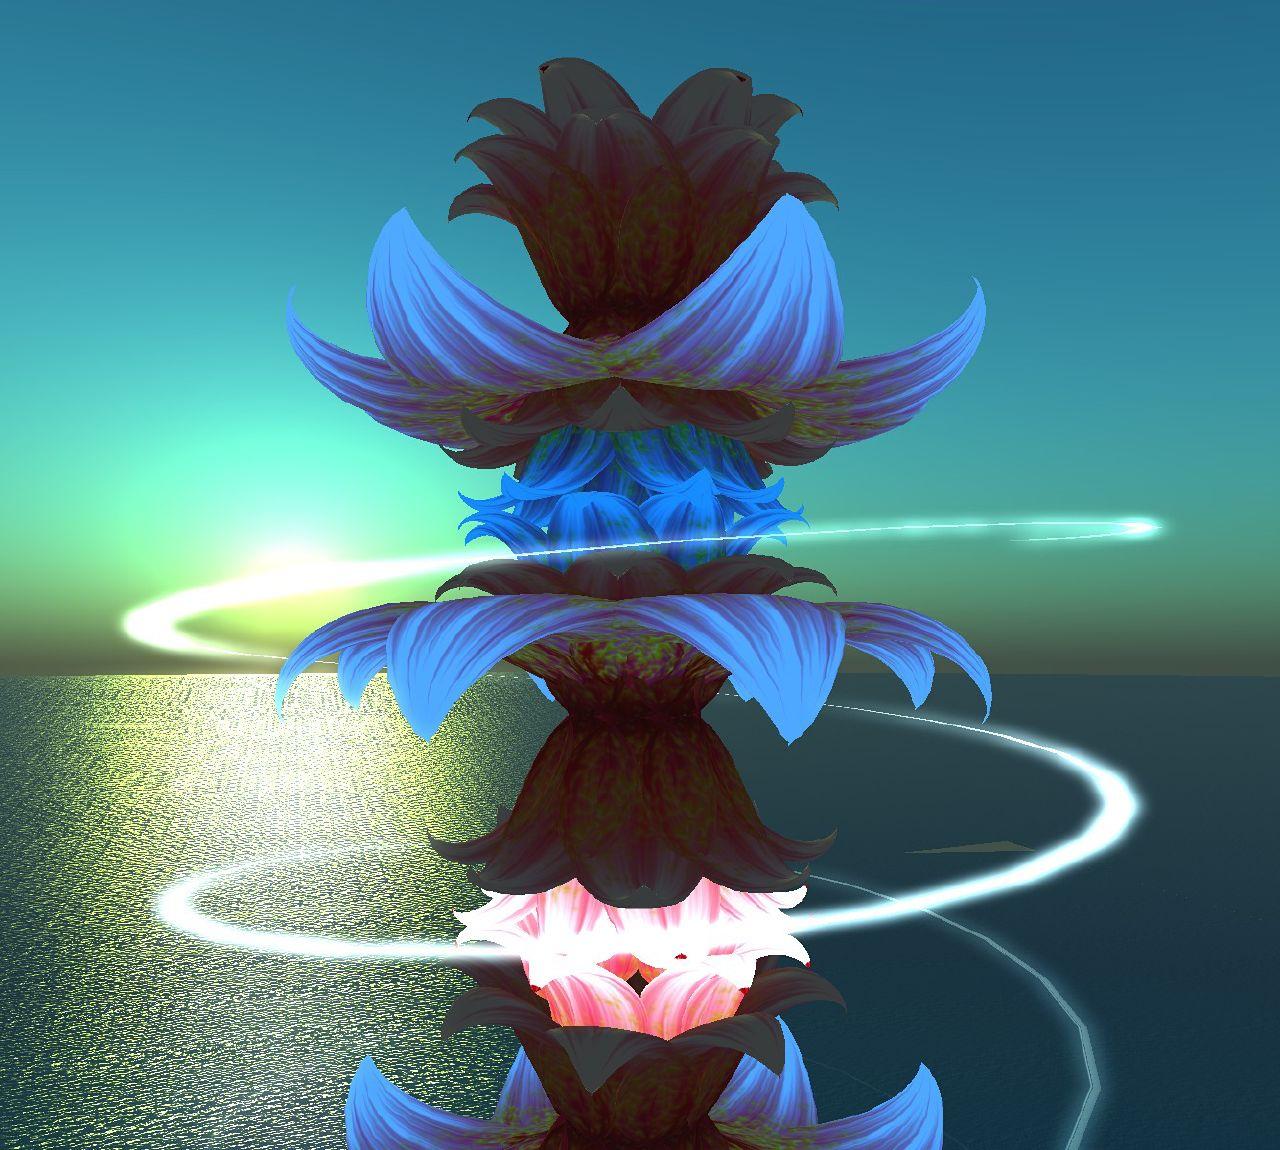 Eshi's Flower Tower